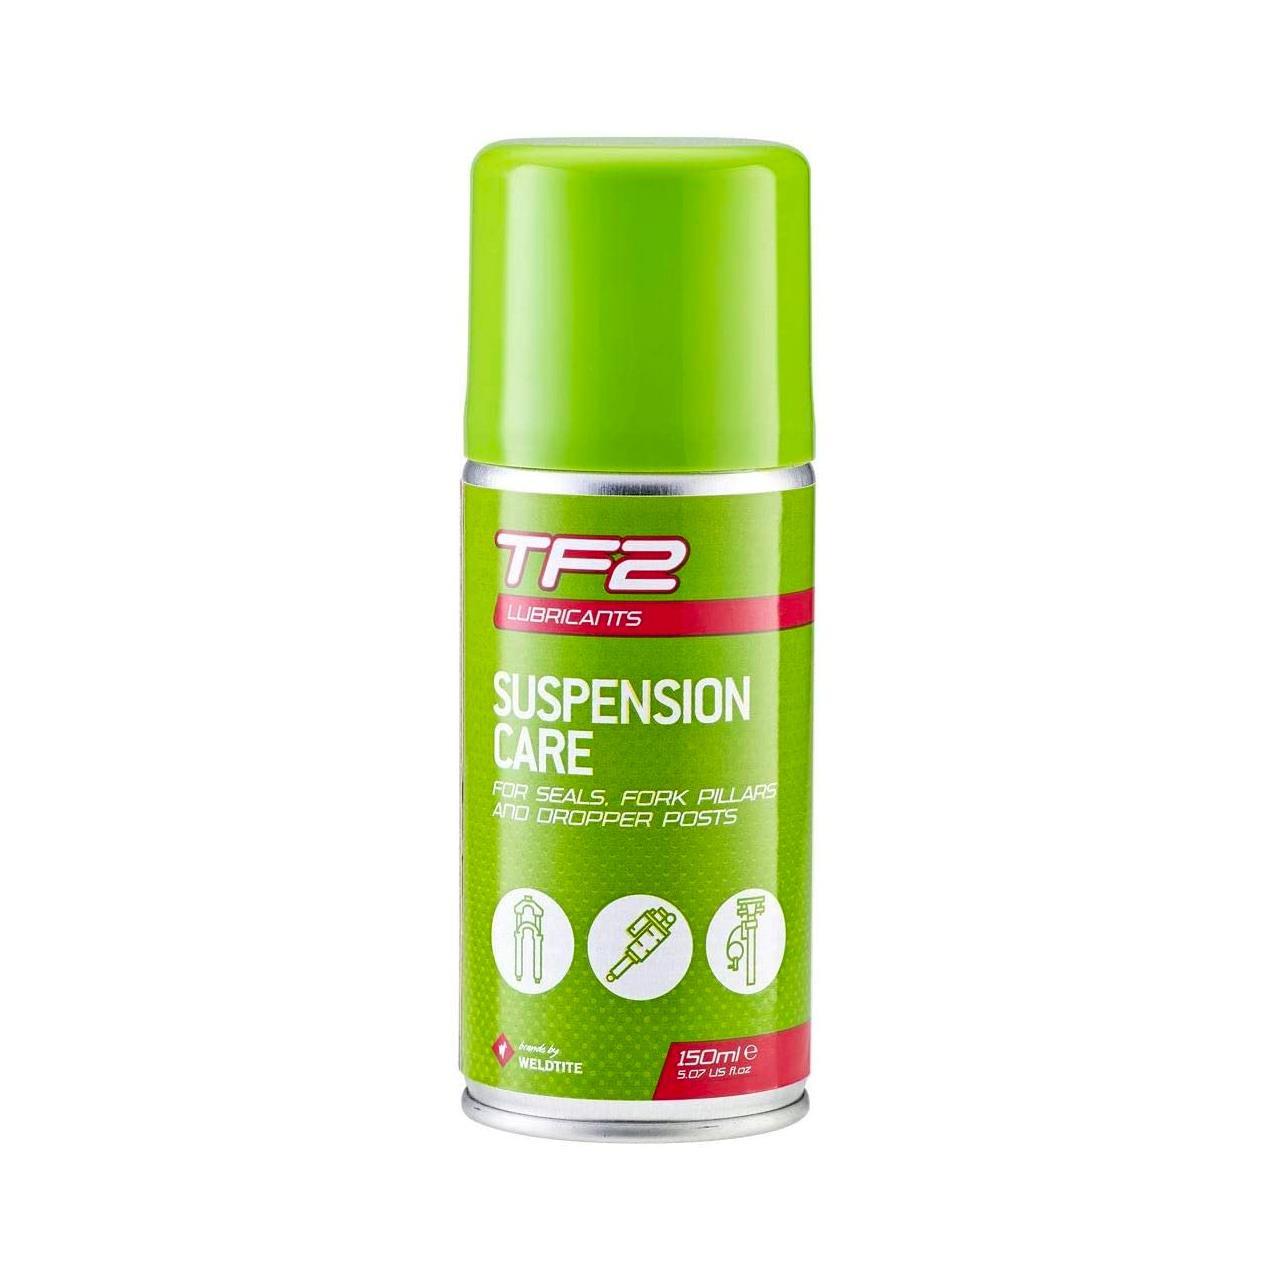 TF2 Suspension Care Spray (150ml)